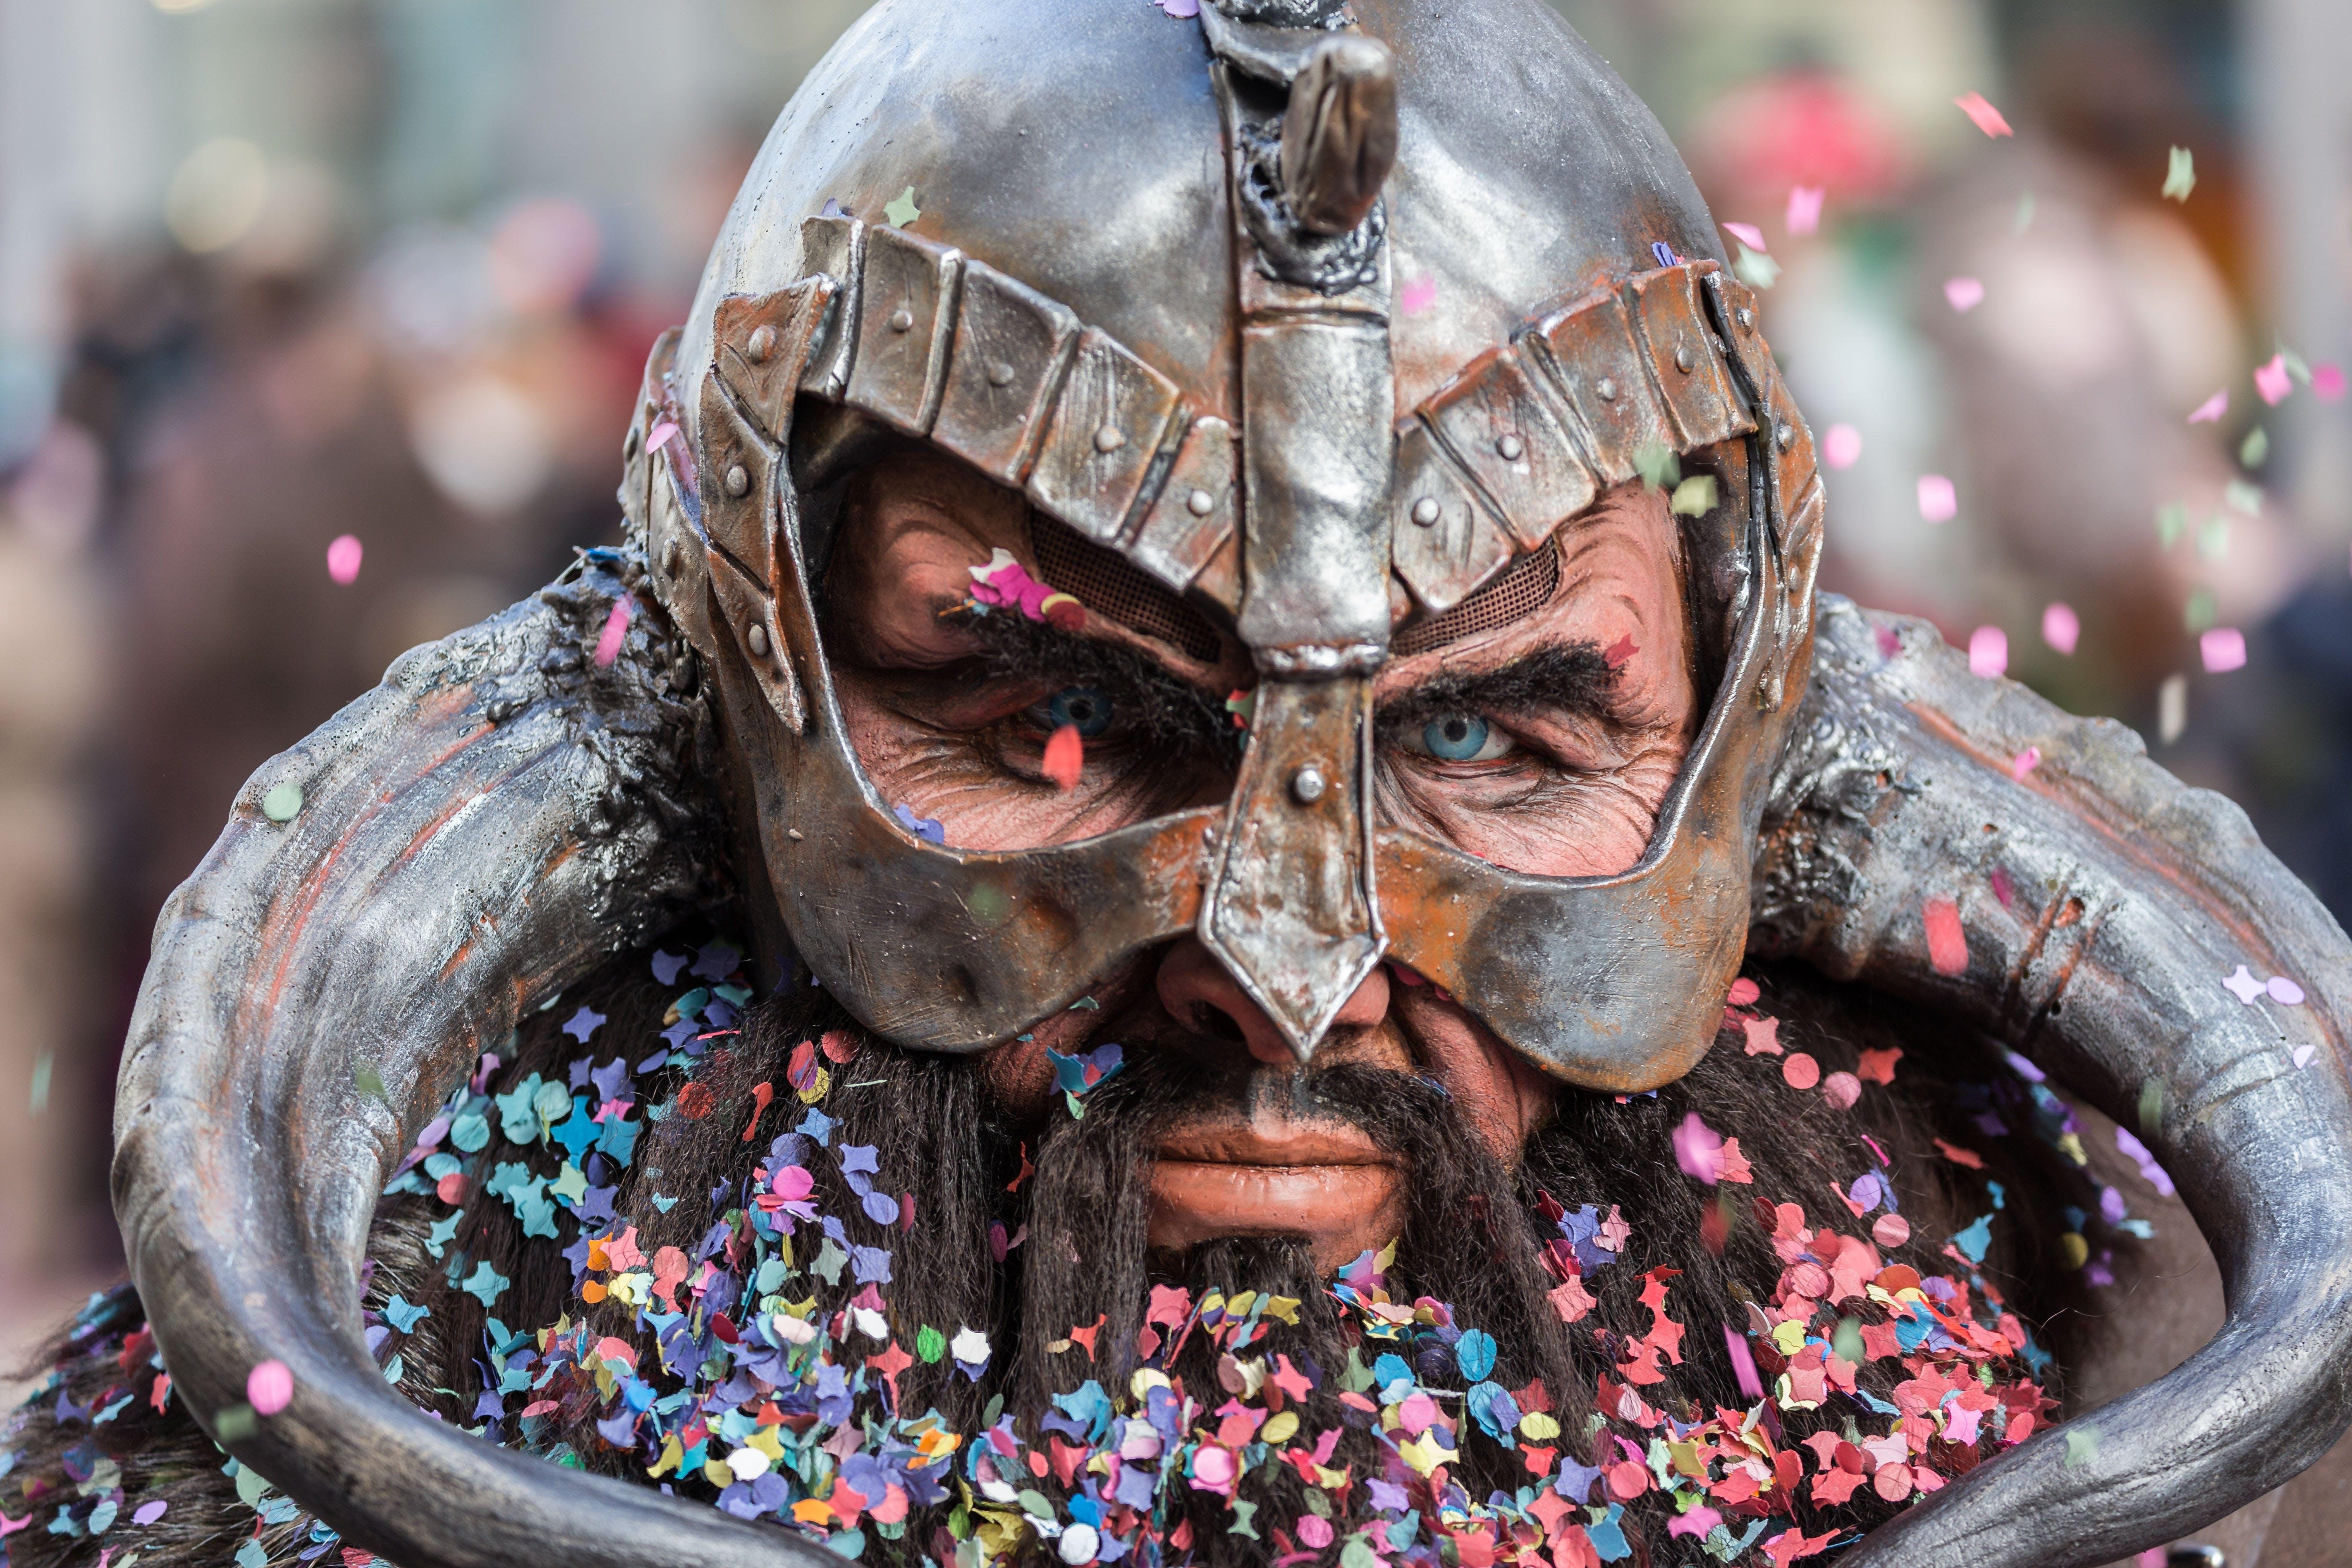 Man Wearing Viking Helmet Focus Photography · Free Stock Photo